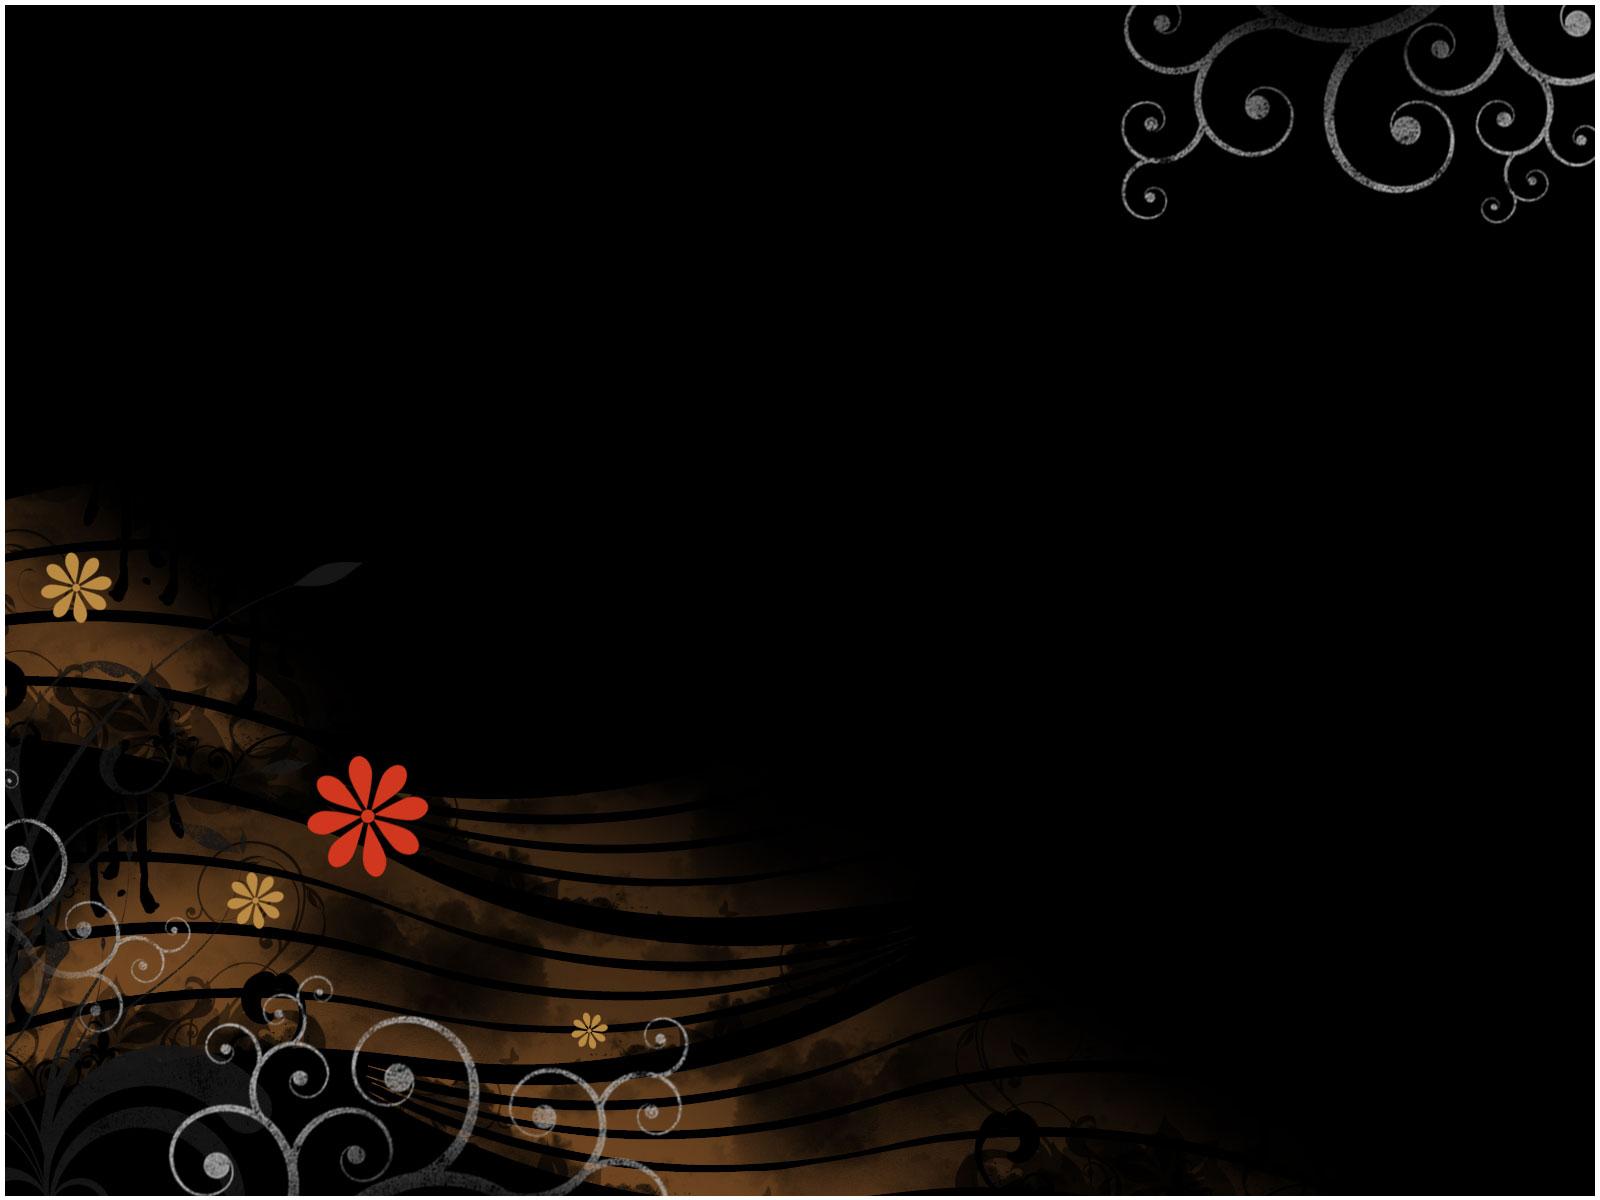 desktop wallpaper for free mac free christmas wallpaper 105 animated wallpapers for download wallpaper